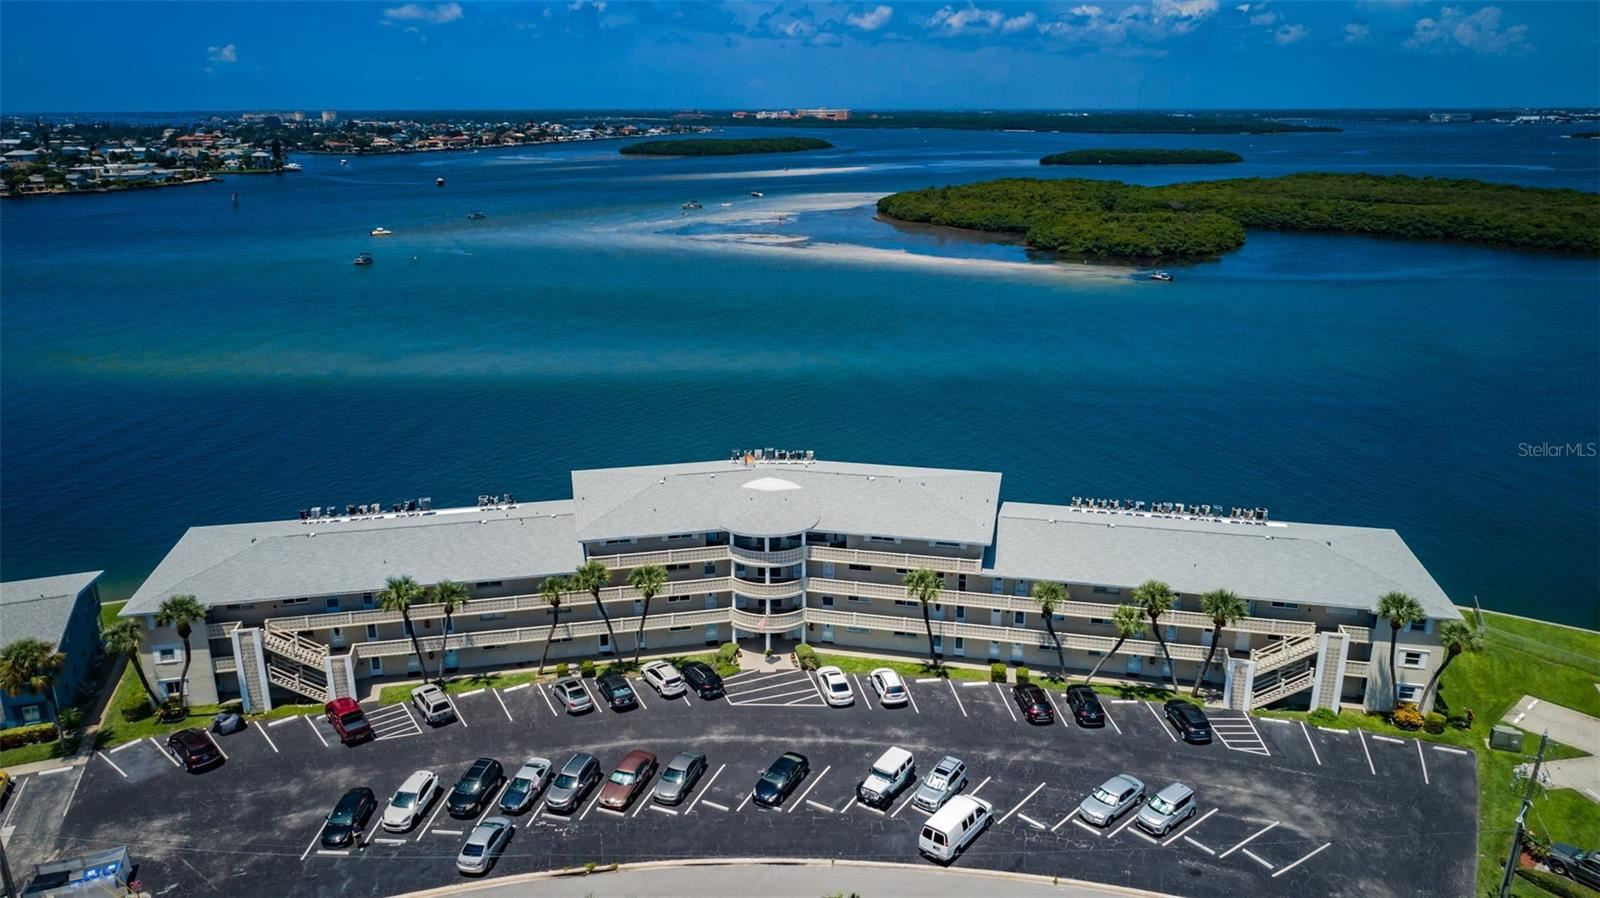 280 126TH AVENUE #211, Treasure Island, FL 33706 - MLS#: U8138999